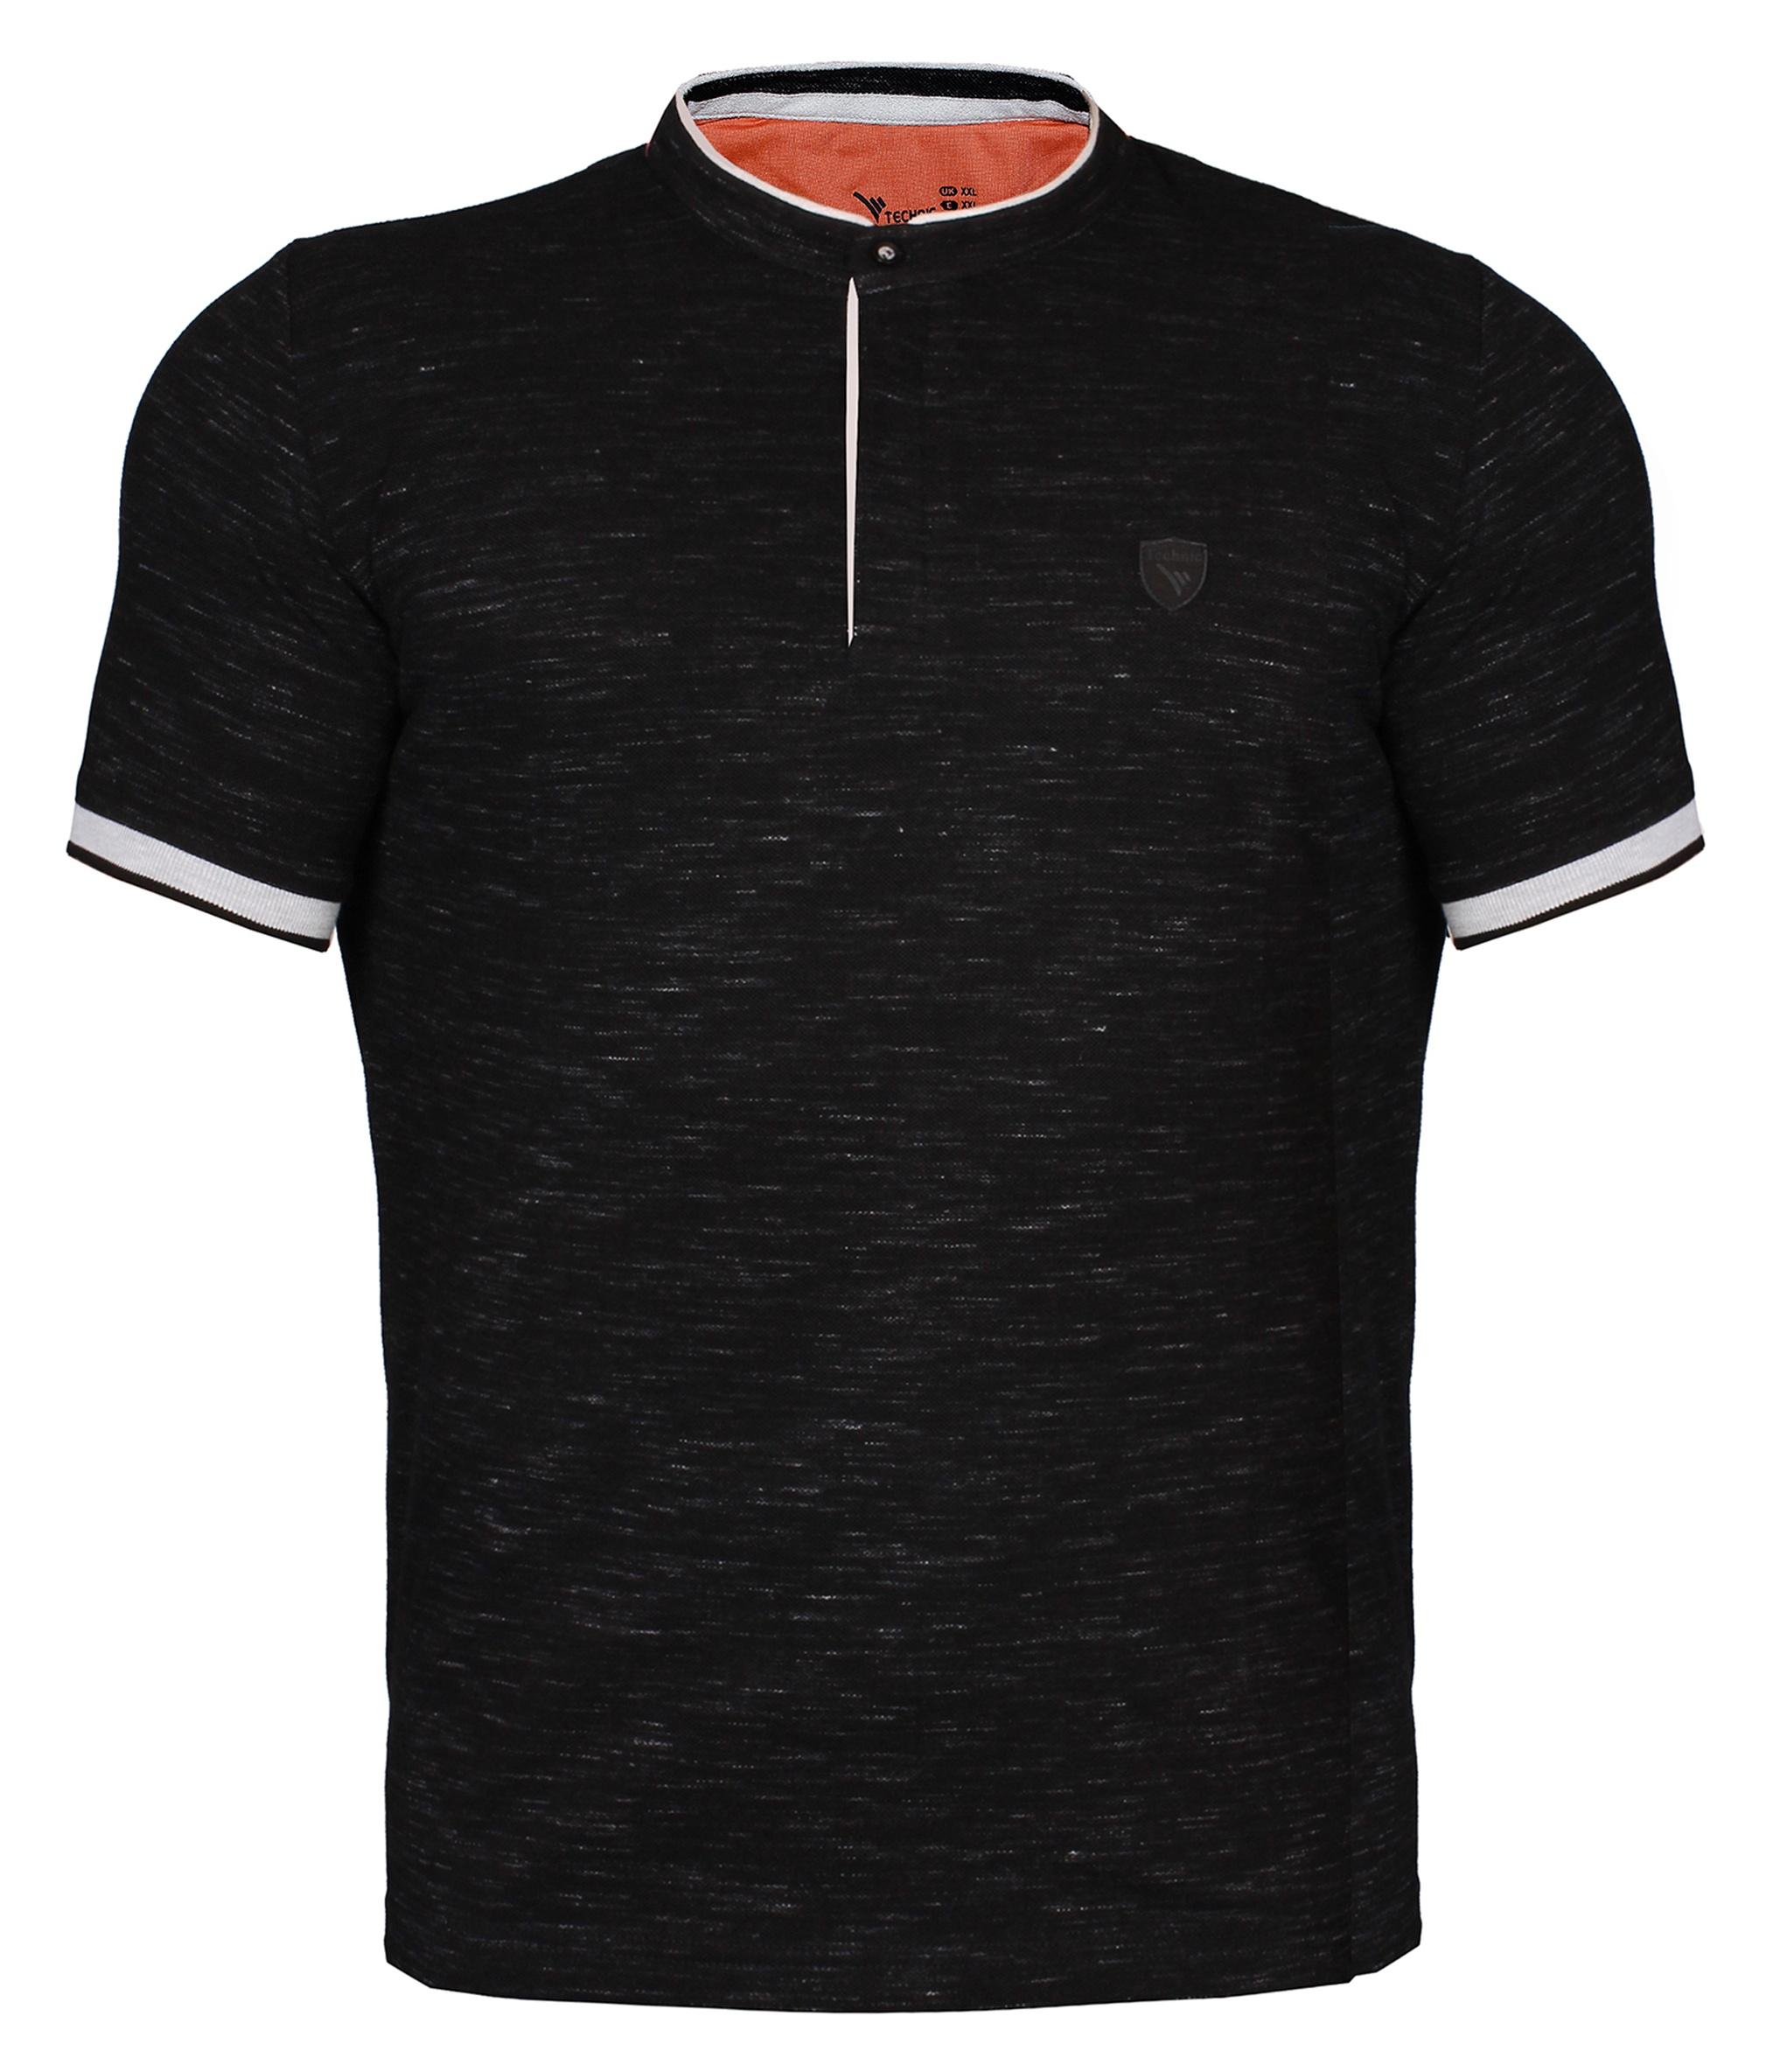 تی شرت مردانه تکنیک اسپرت کد TS-136-ME